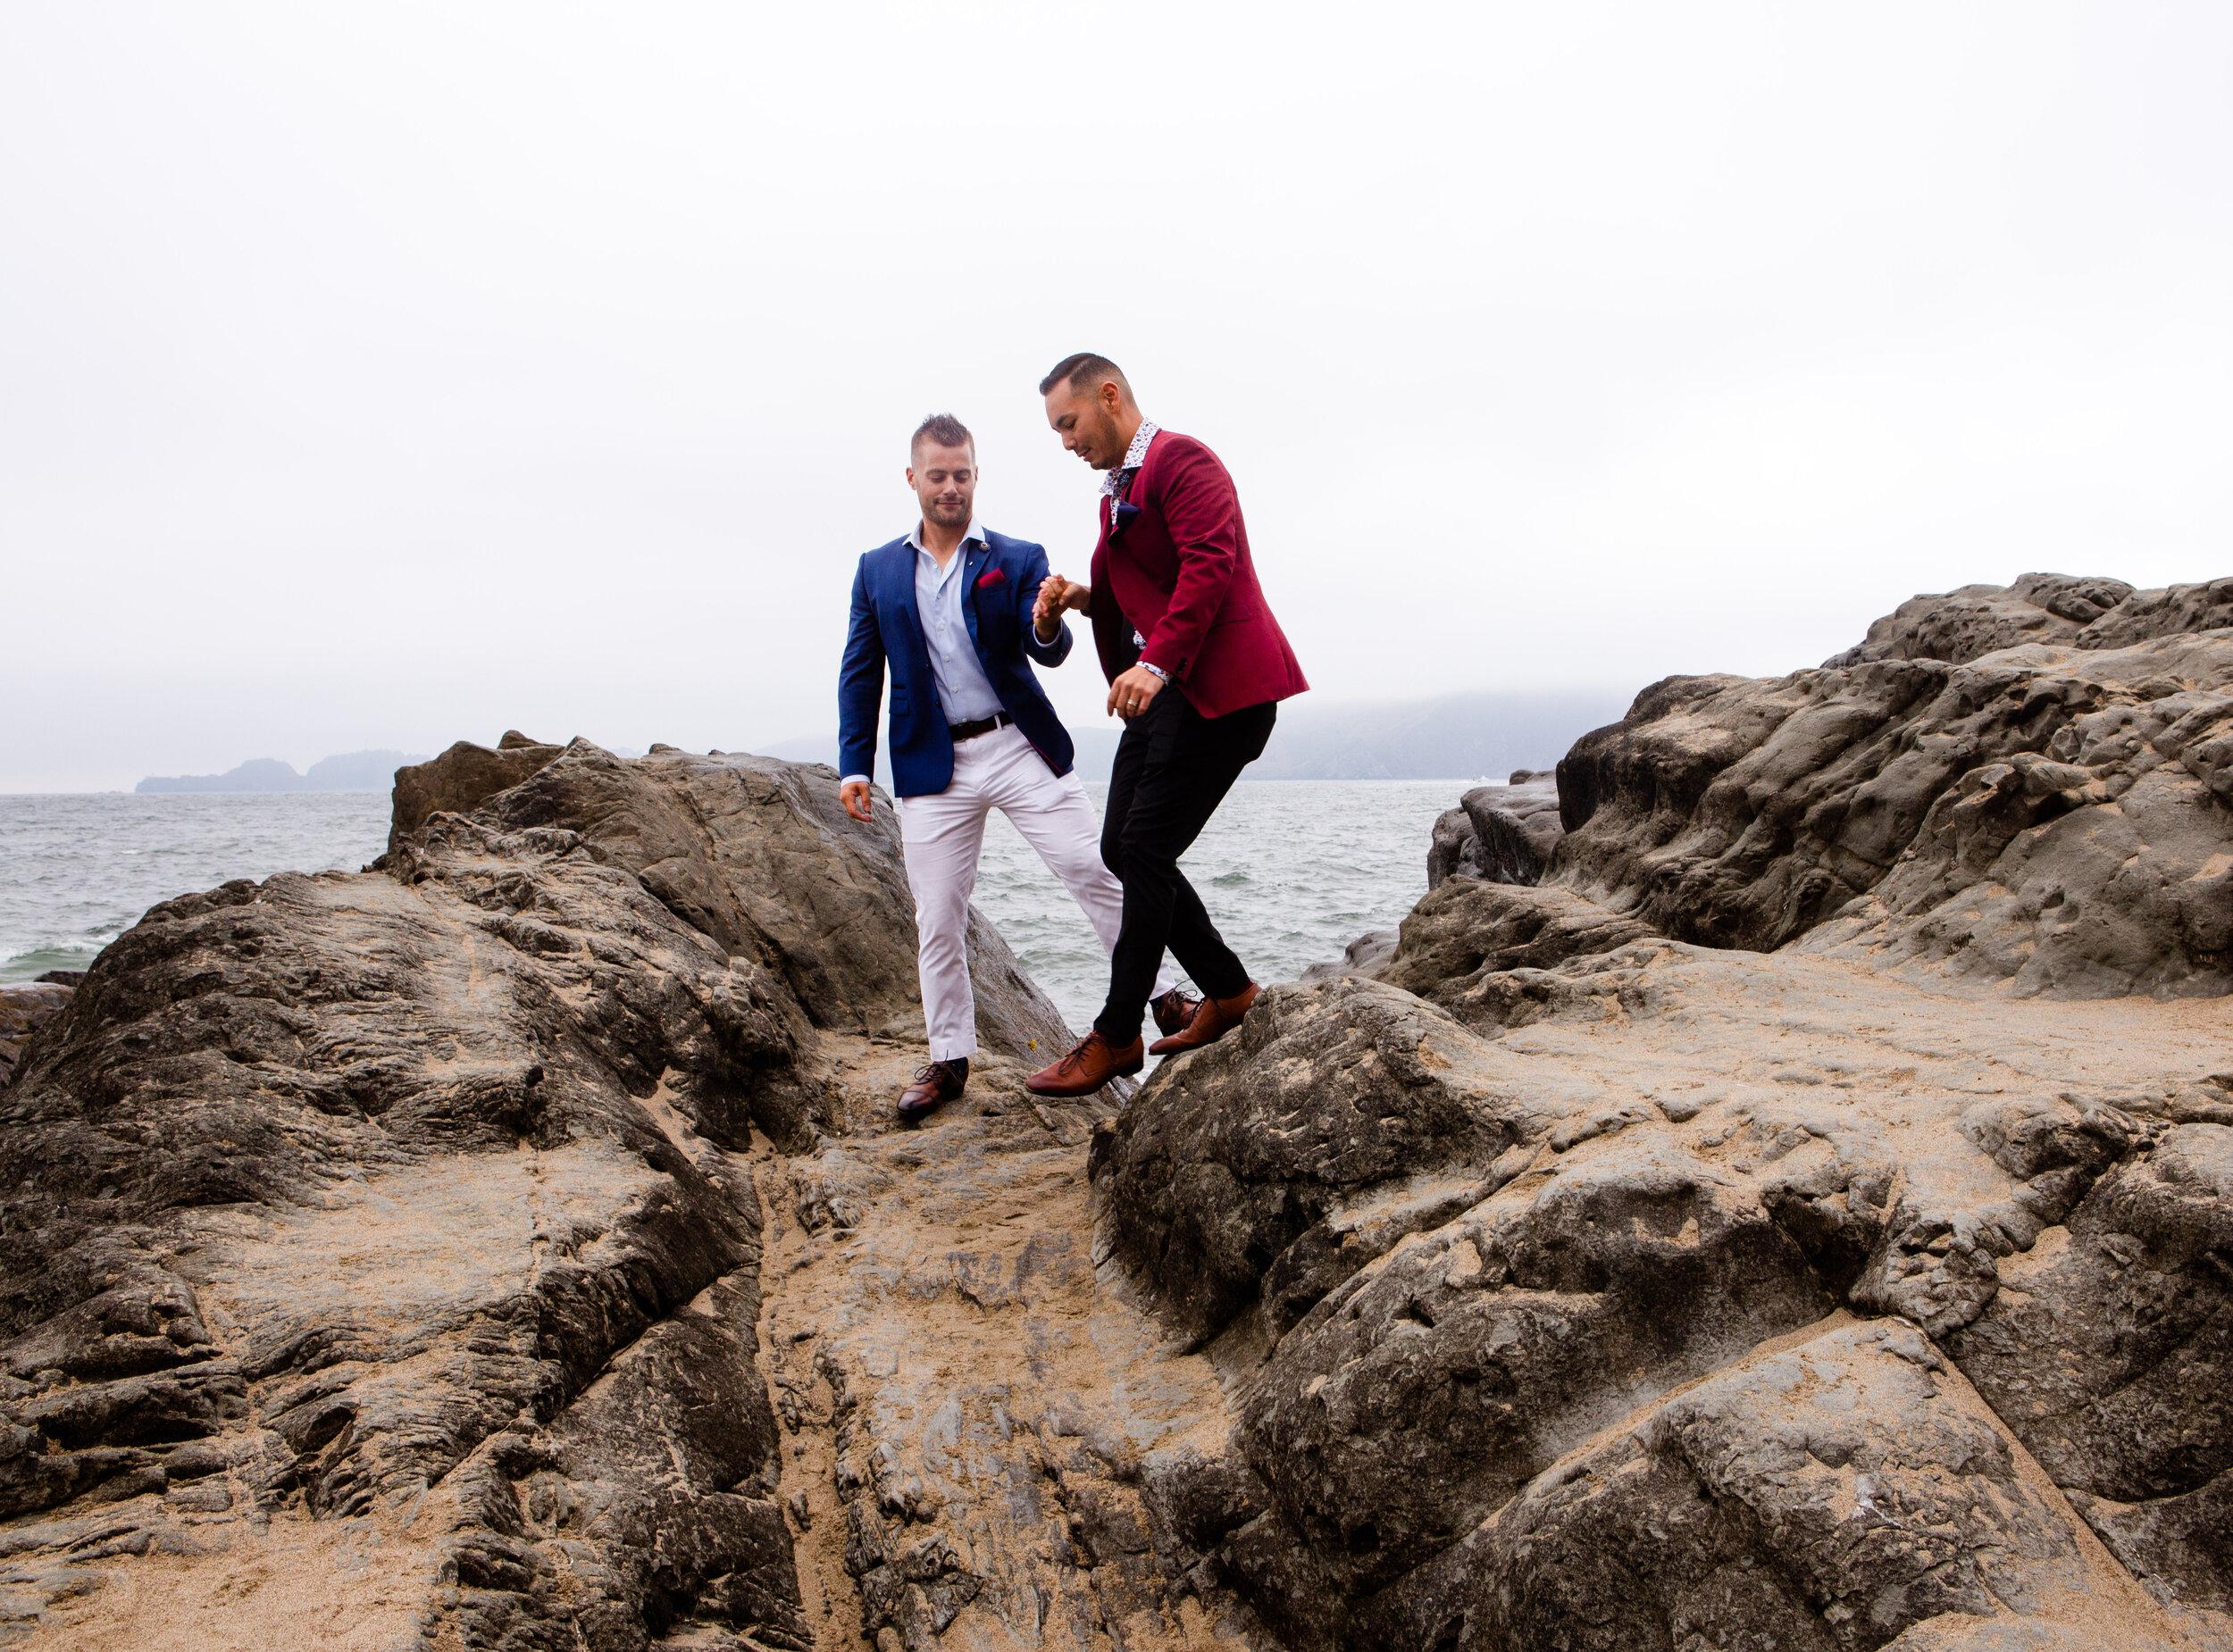 20190726-California-Bakers Beach San Francisco-Mauricio and Parick--46.jpg